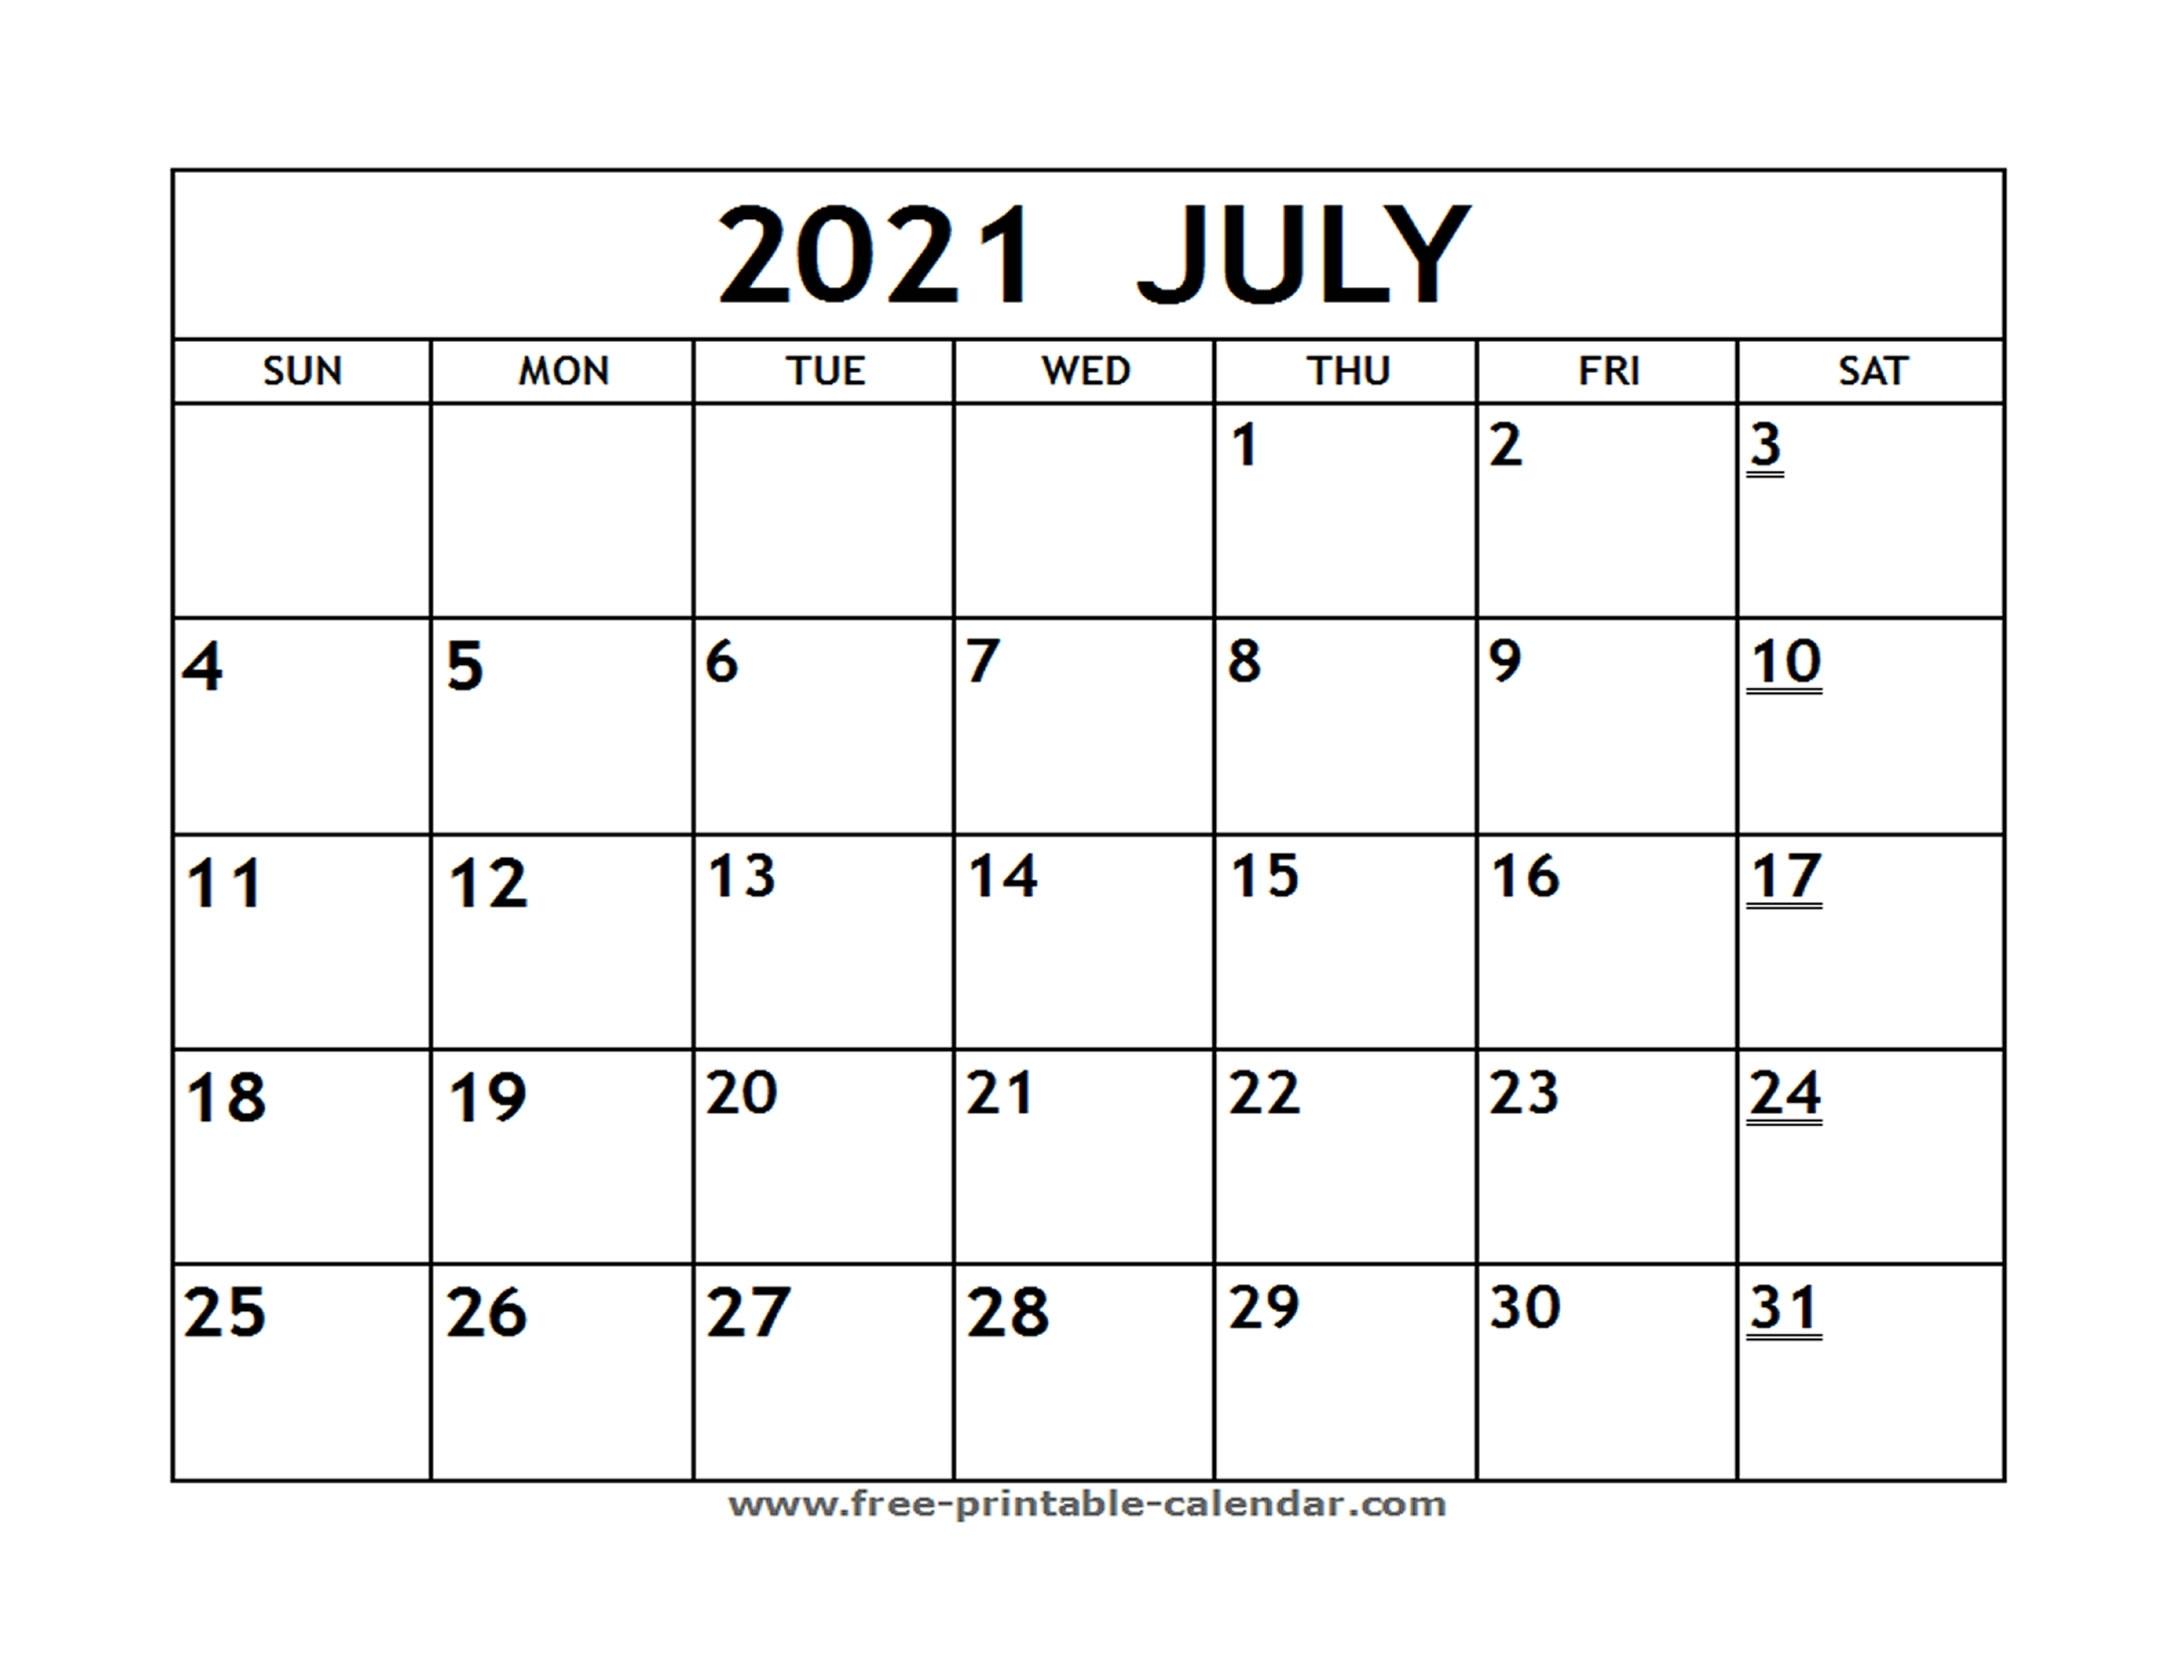 Printable 2021 July Calendar - Free-Printable-Calendar